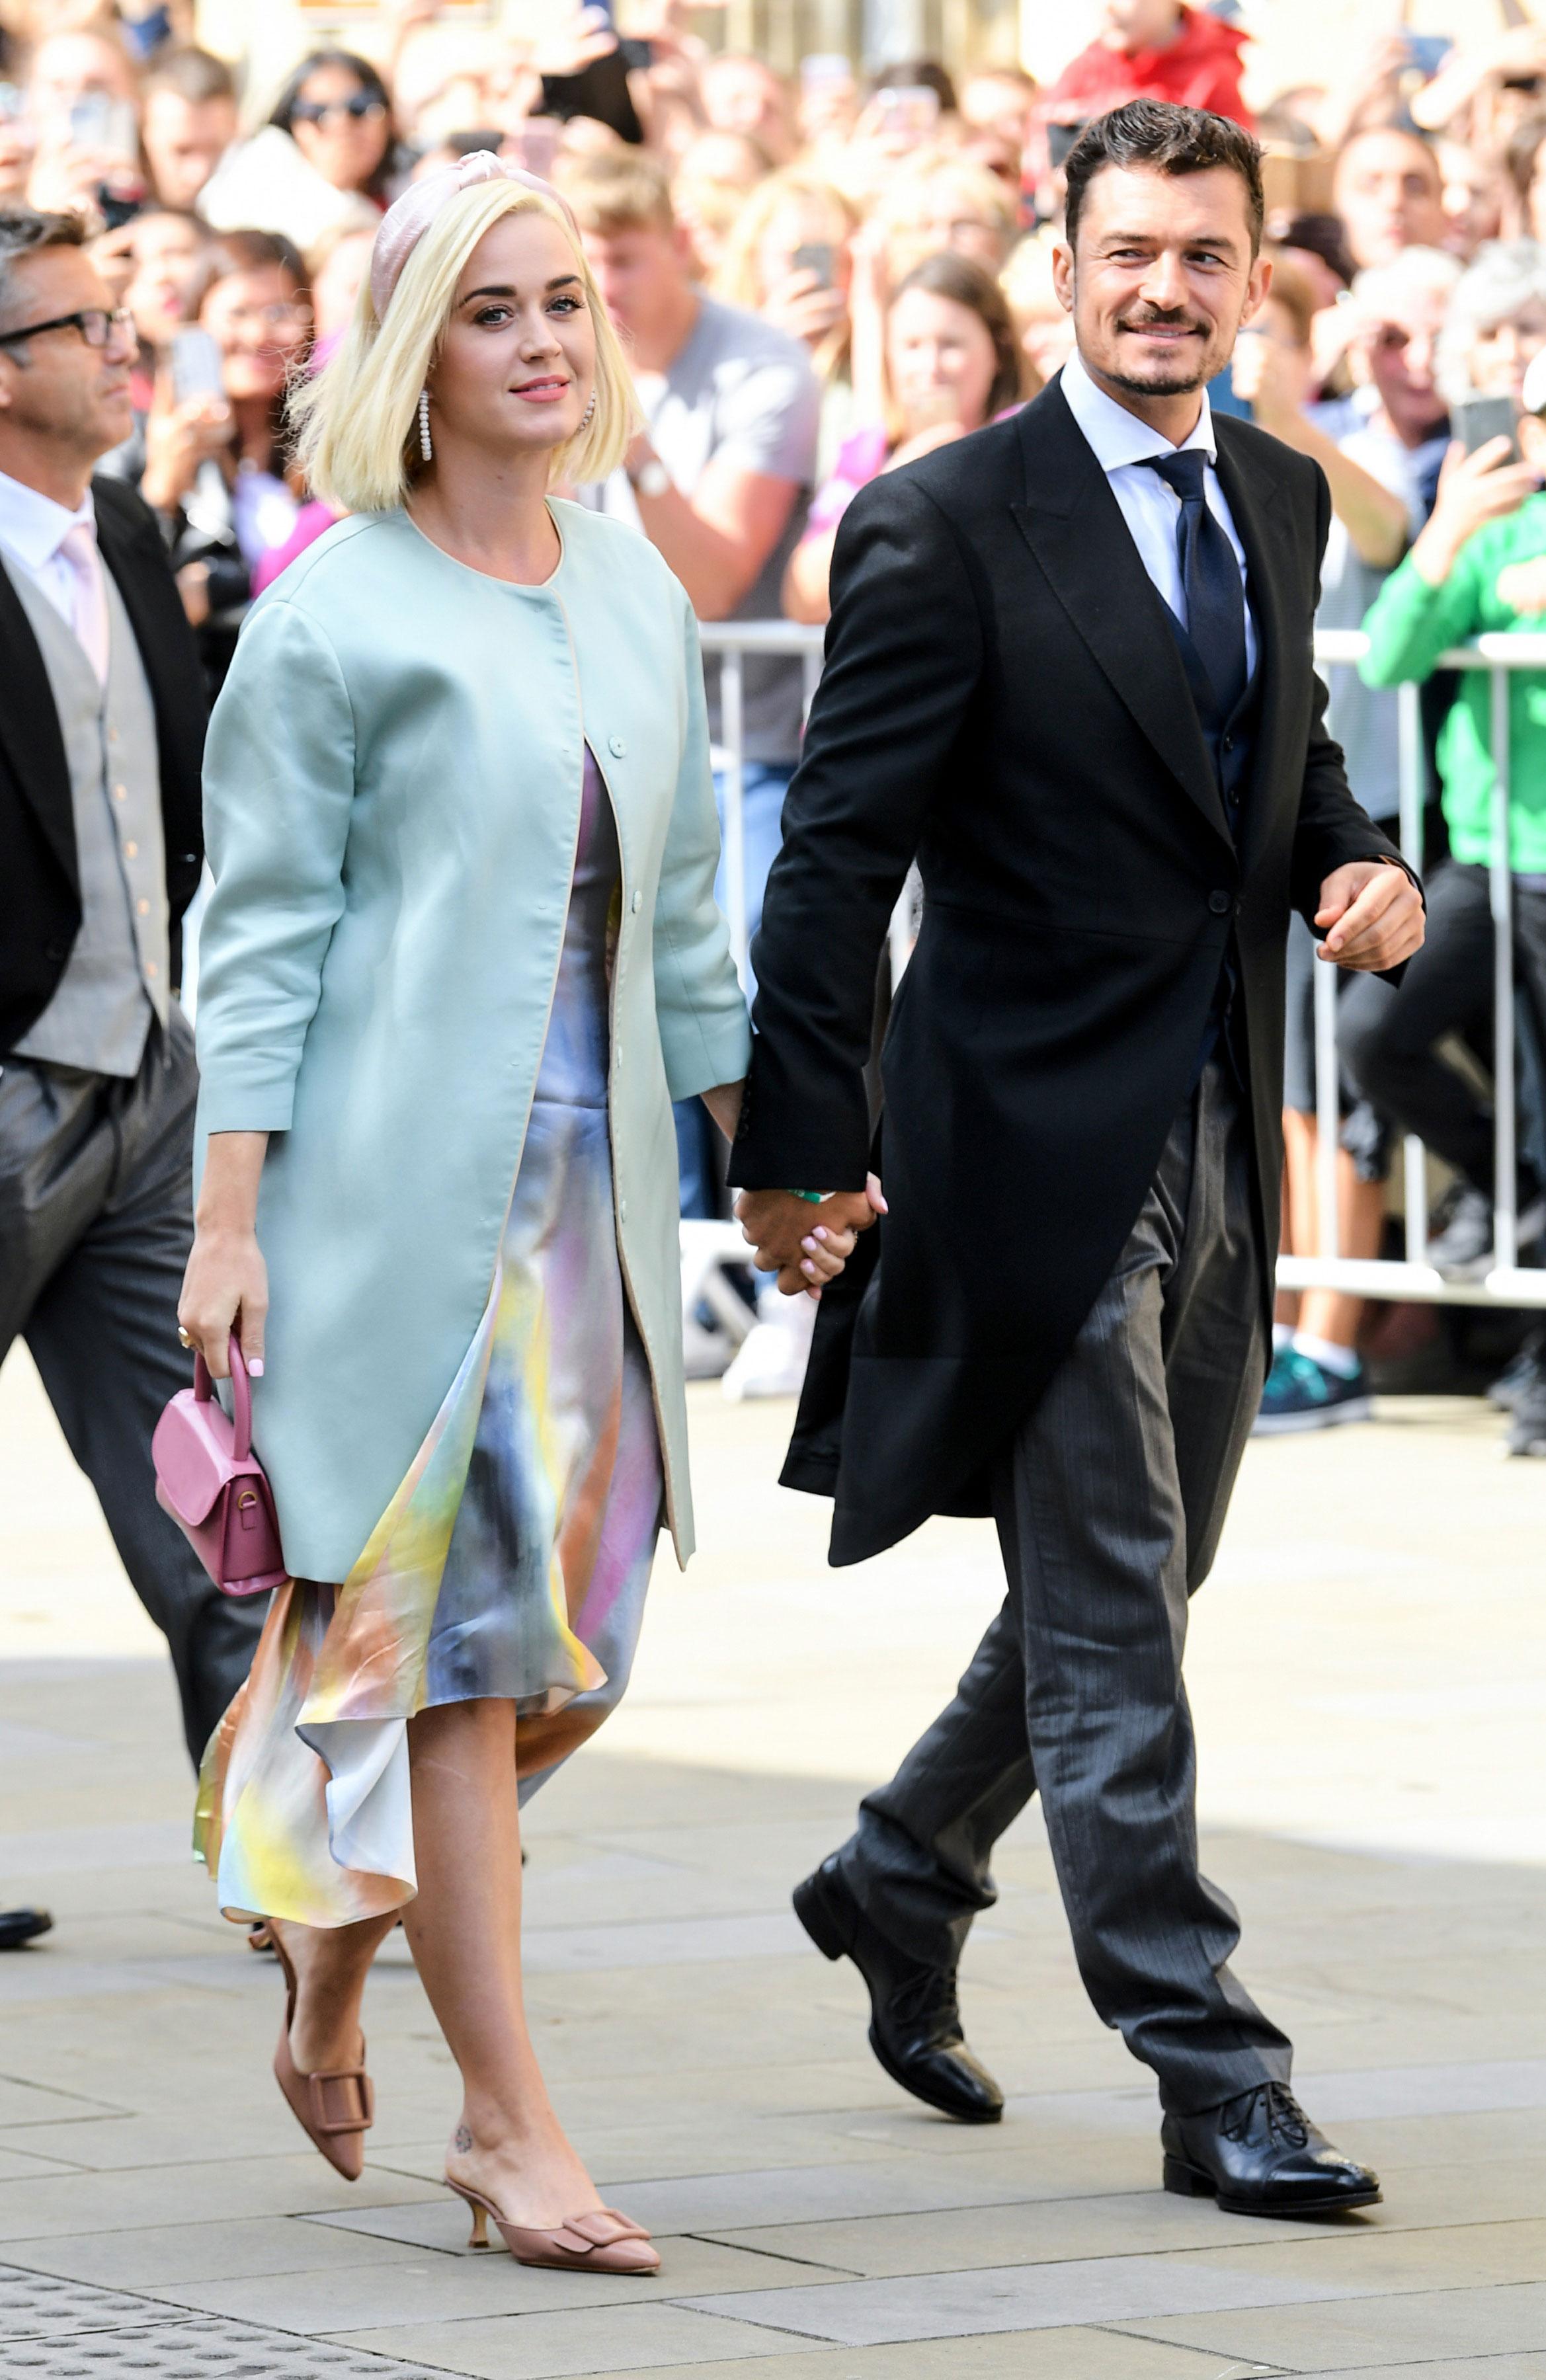 Katy Perry More Celebrities Attend Ellie Goulding S Wedding